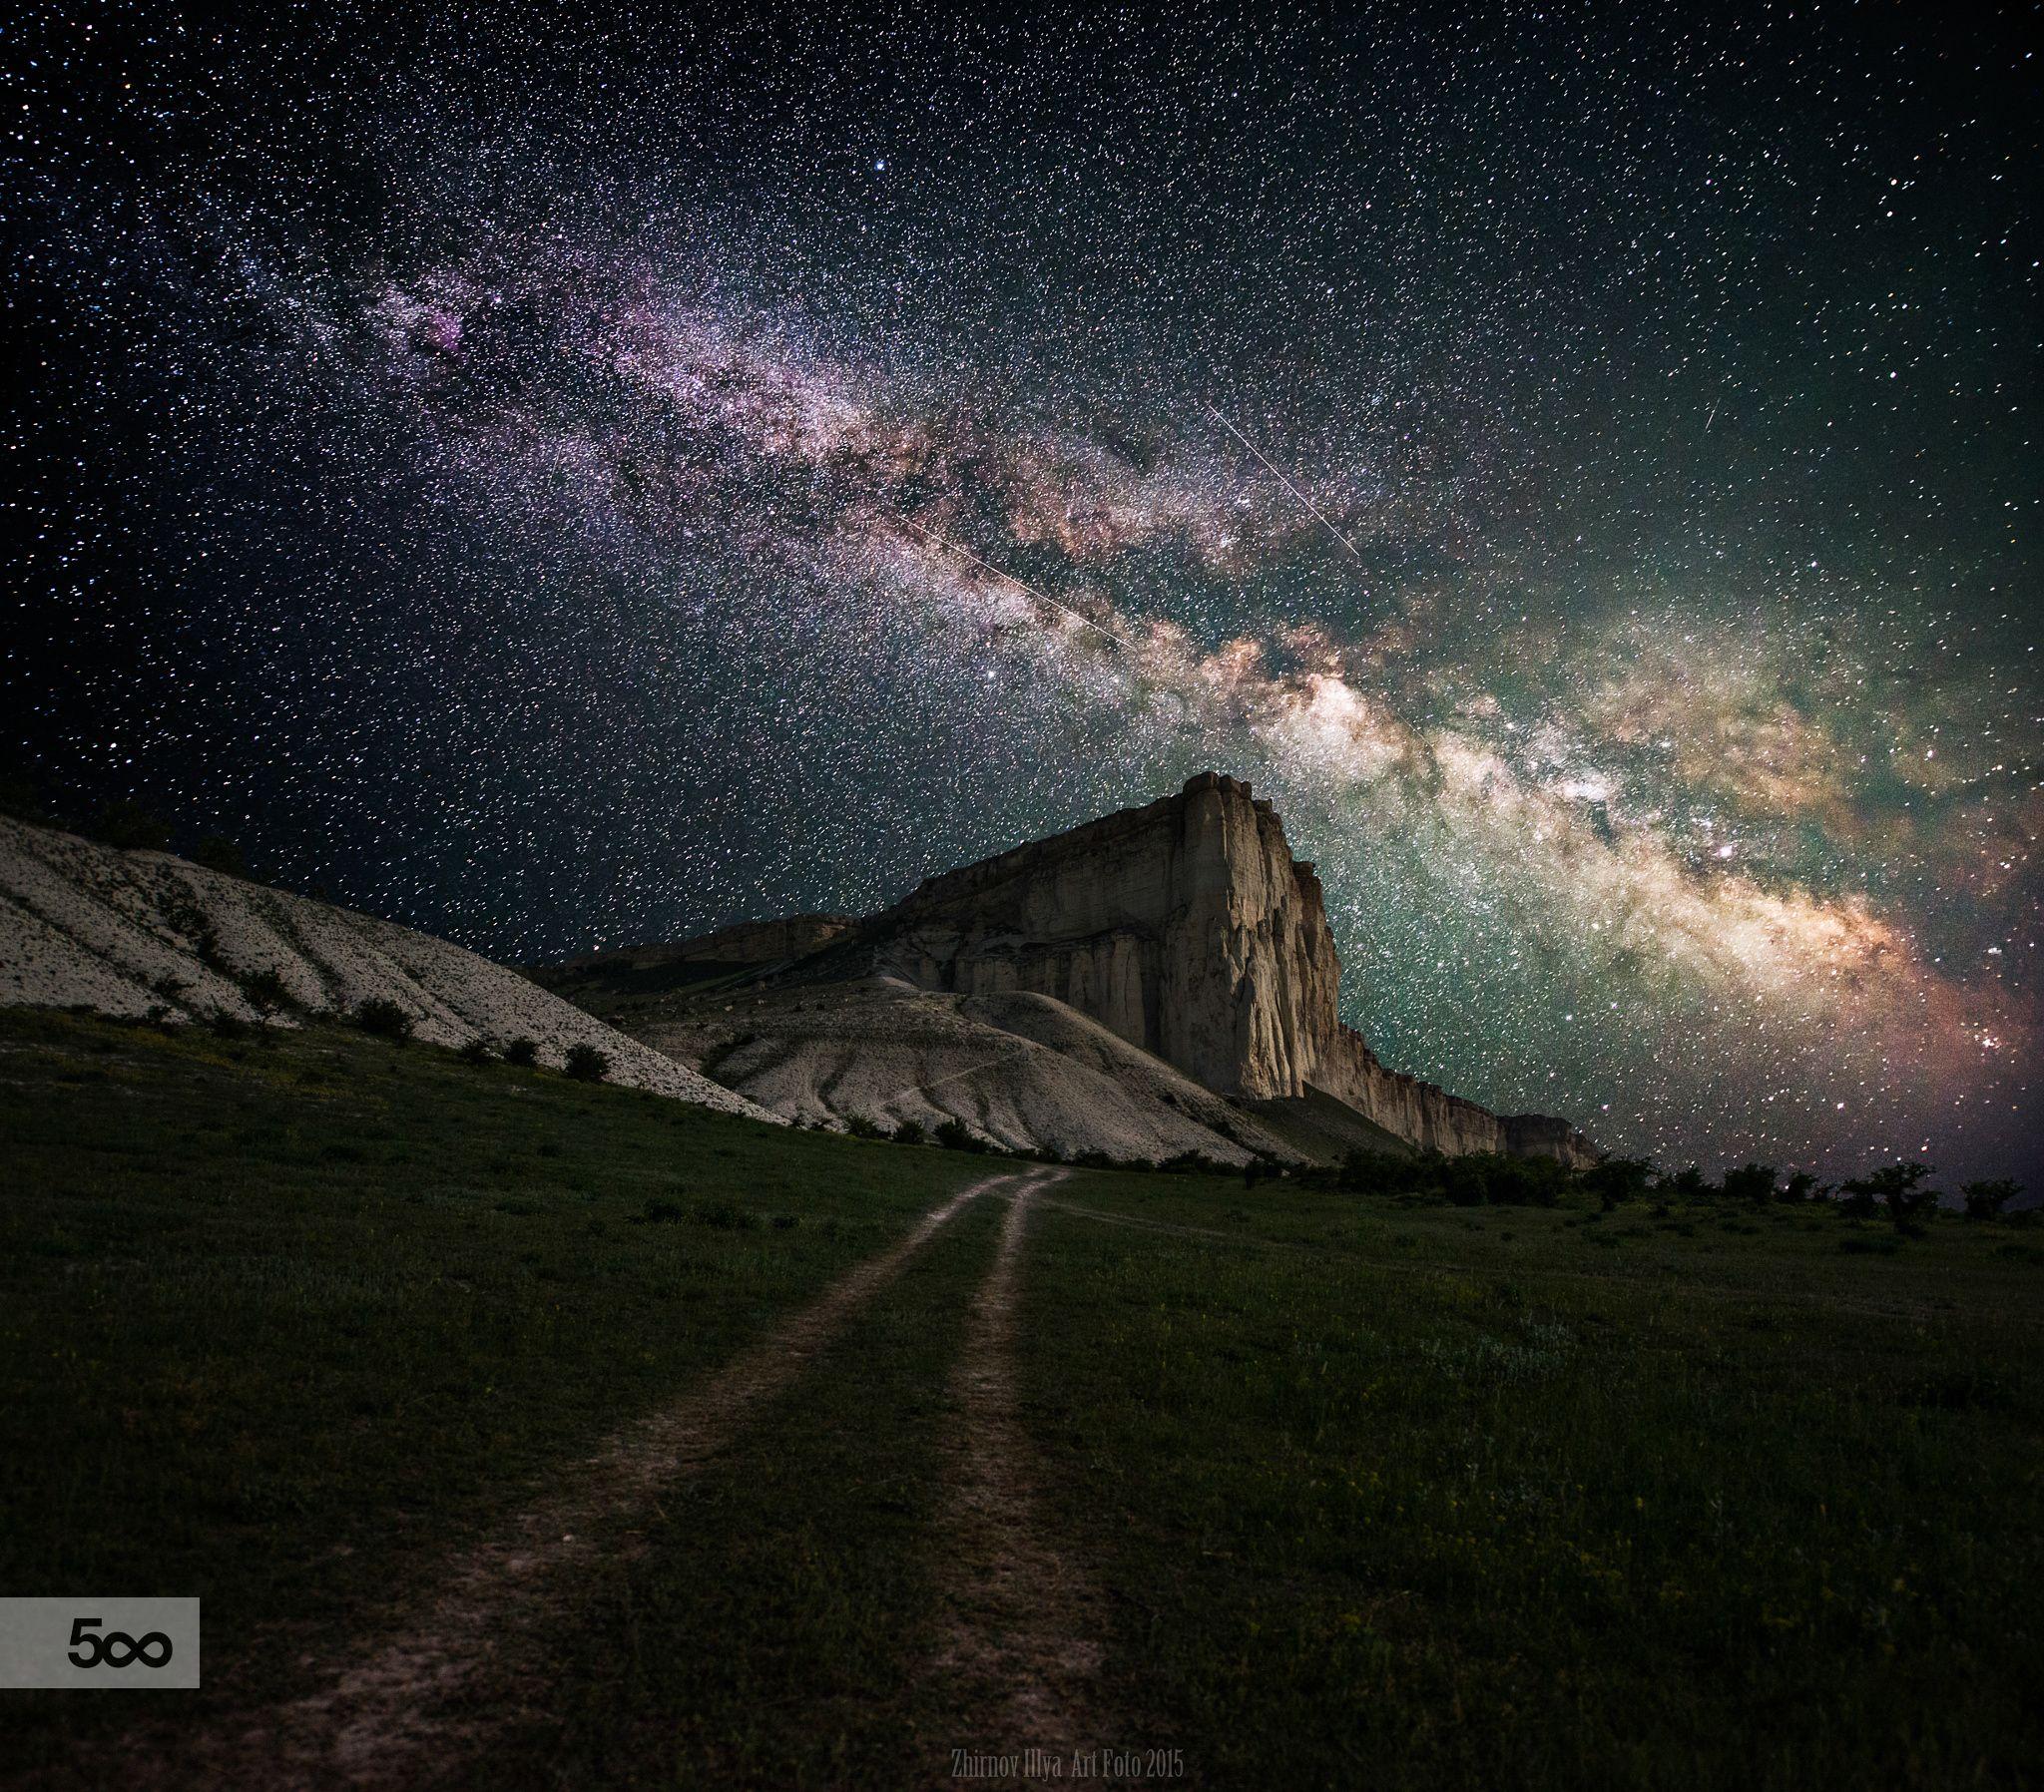 The White Rock By Ilya Zhirnov On 500px Astrophotography Forgotten Galaxy Galac Beautiful Landscapes Landscape Photography Fine Art Landscape Photography